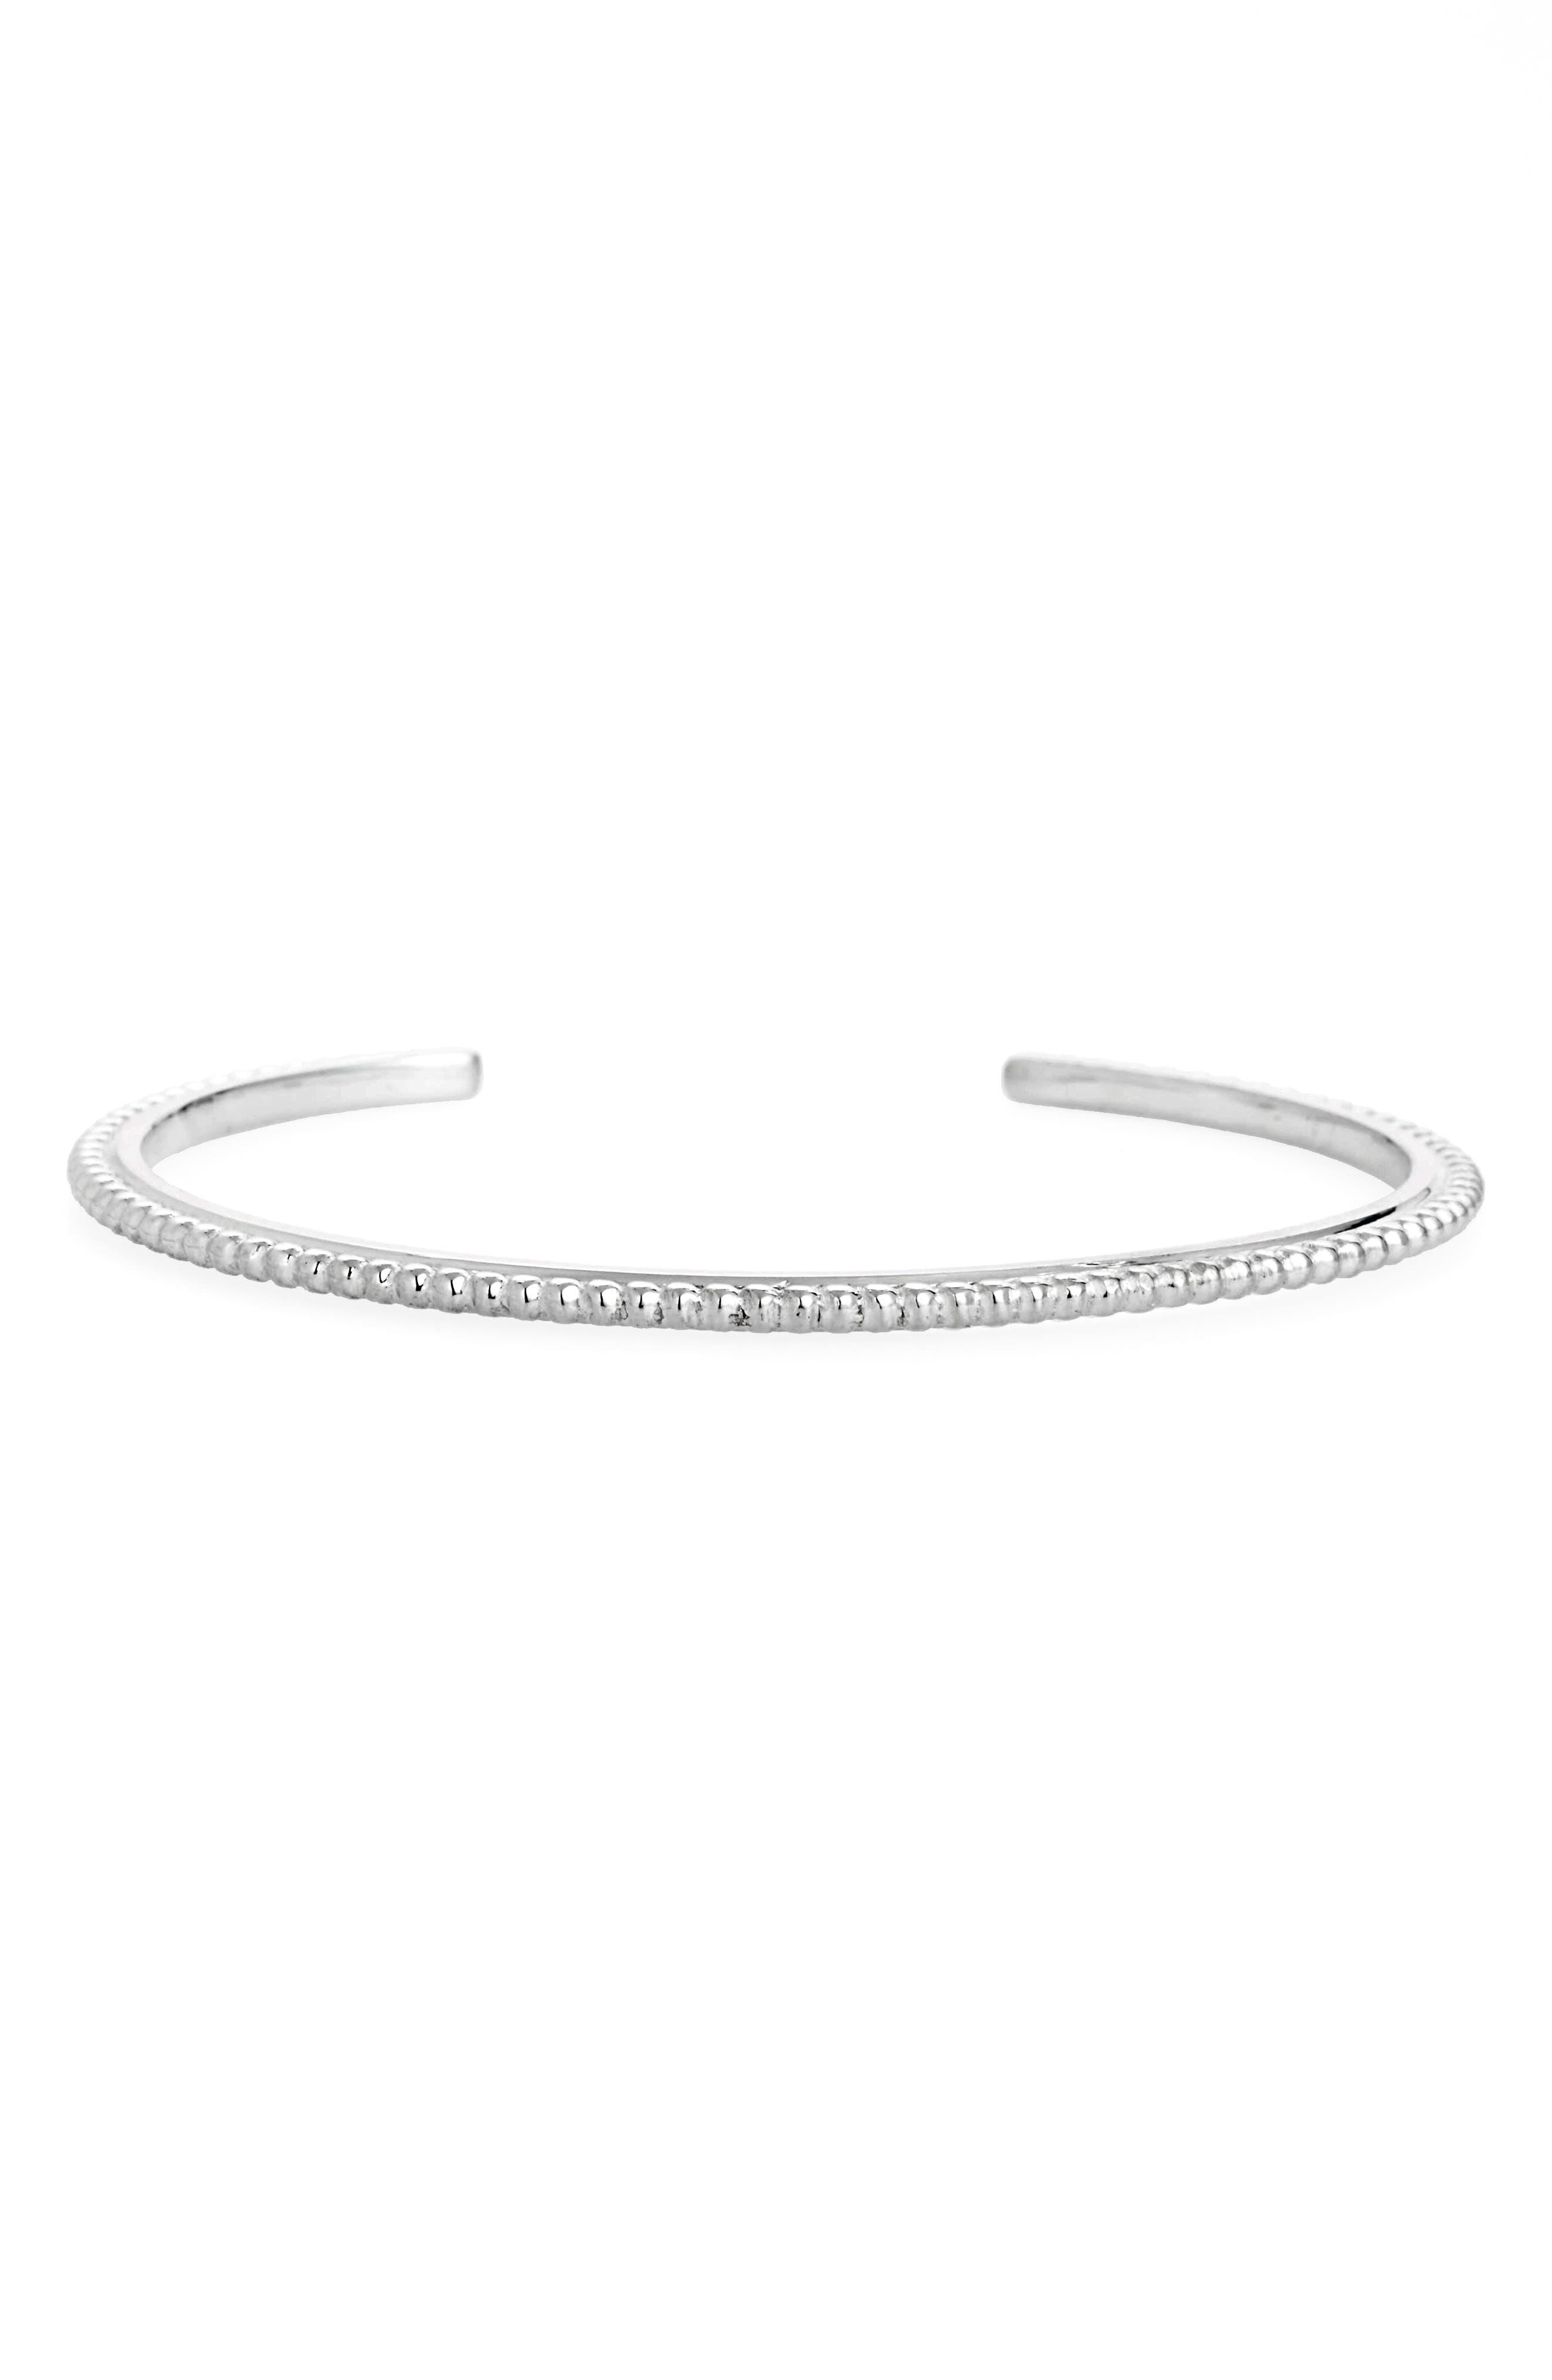 Shinola Coin Edge Cuff Bracelet